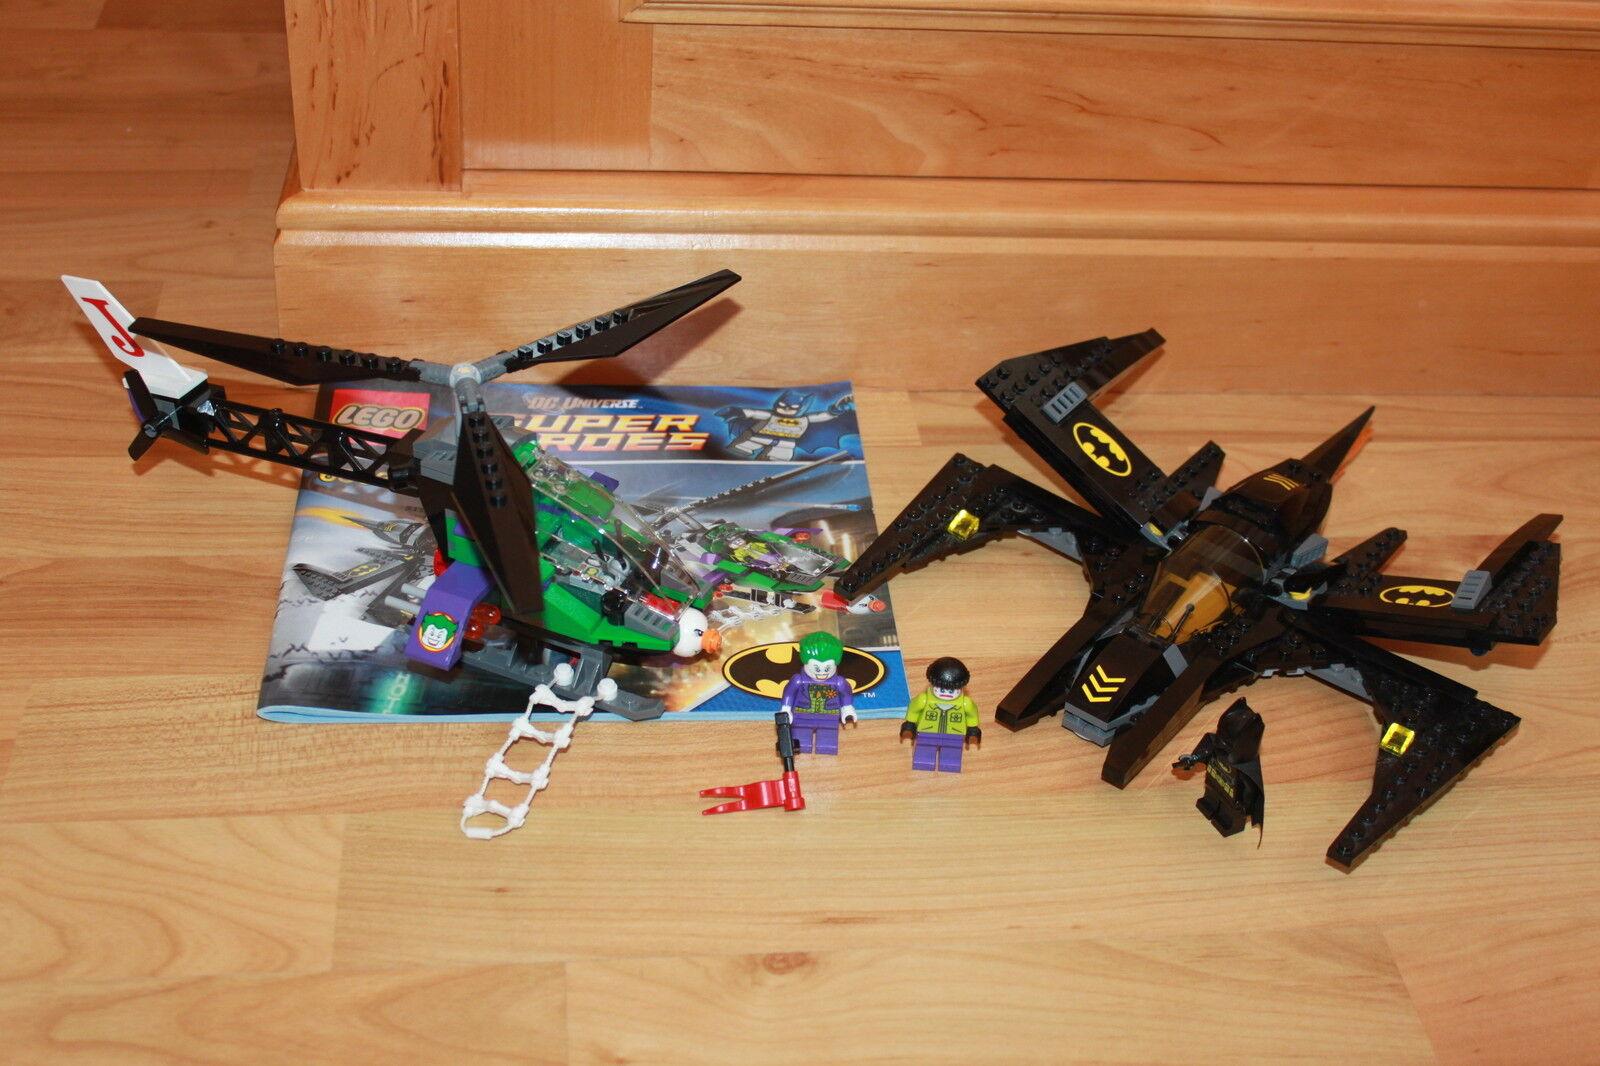 Lego Batman - Batman Set Batwing Kampf über Gotham City mit Anleitung Set 6863